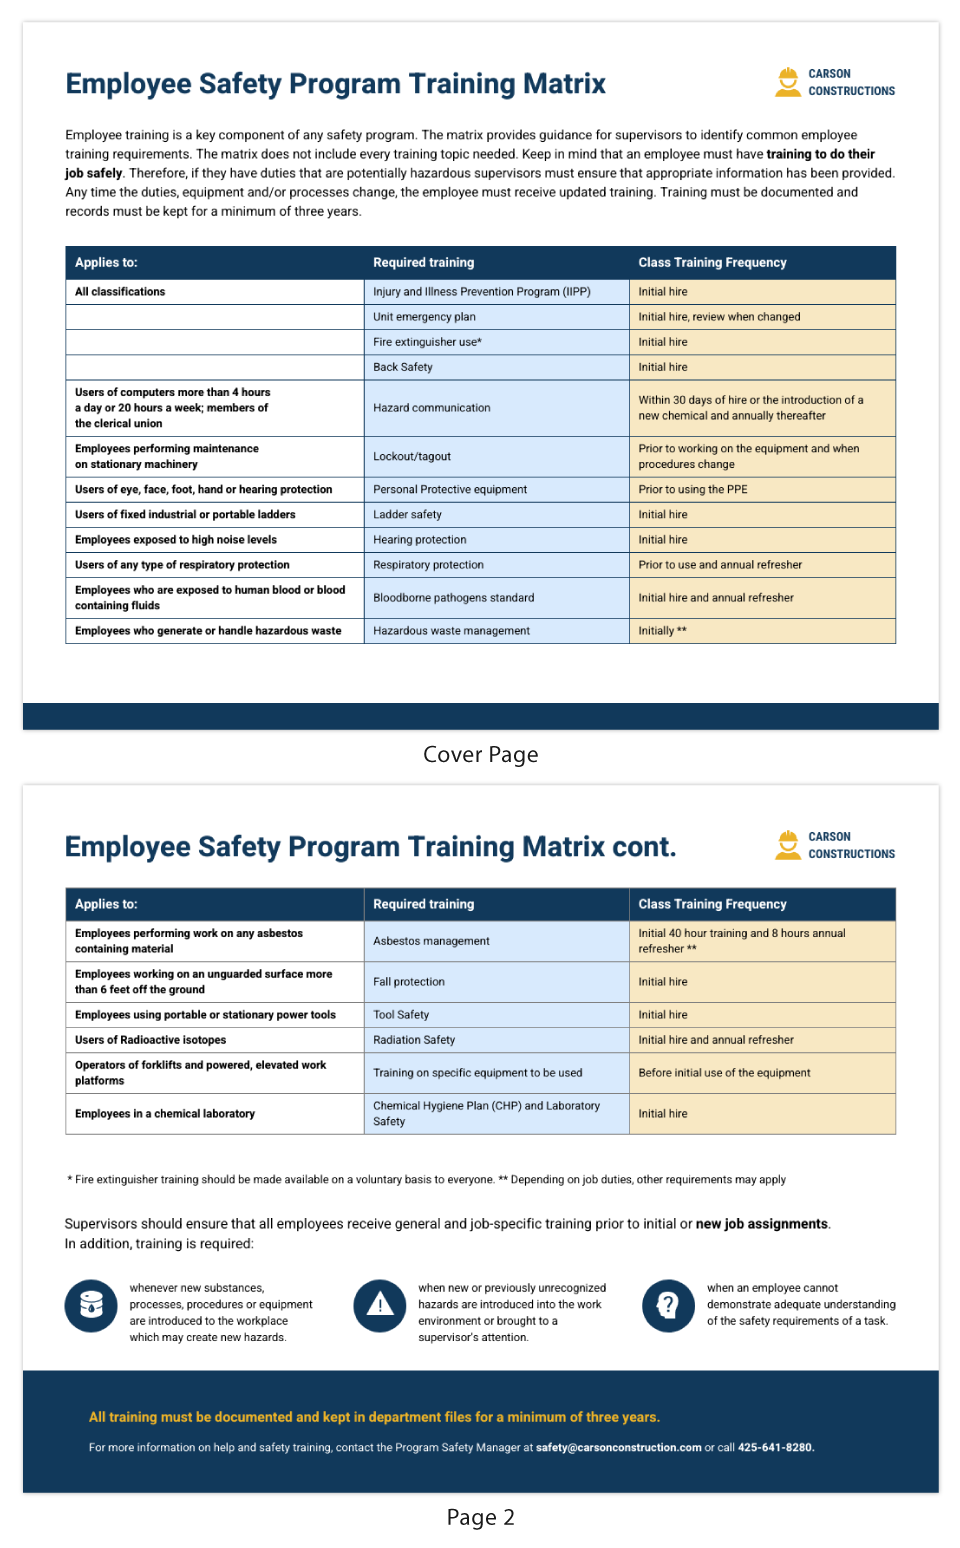 Employee Safety Program Training Matrix Template